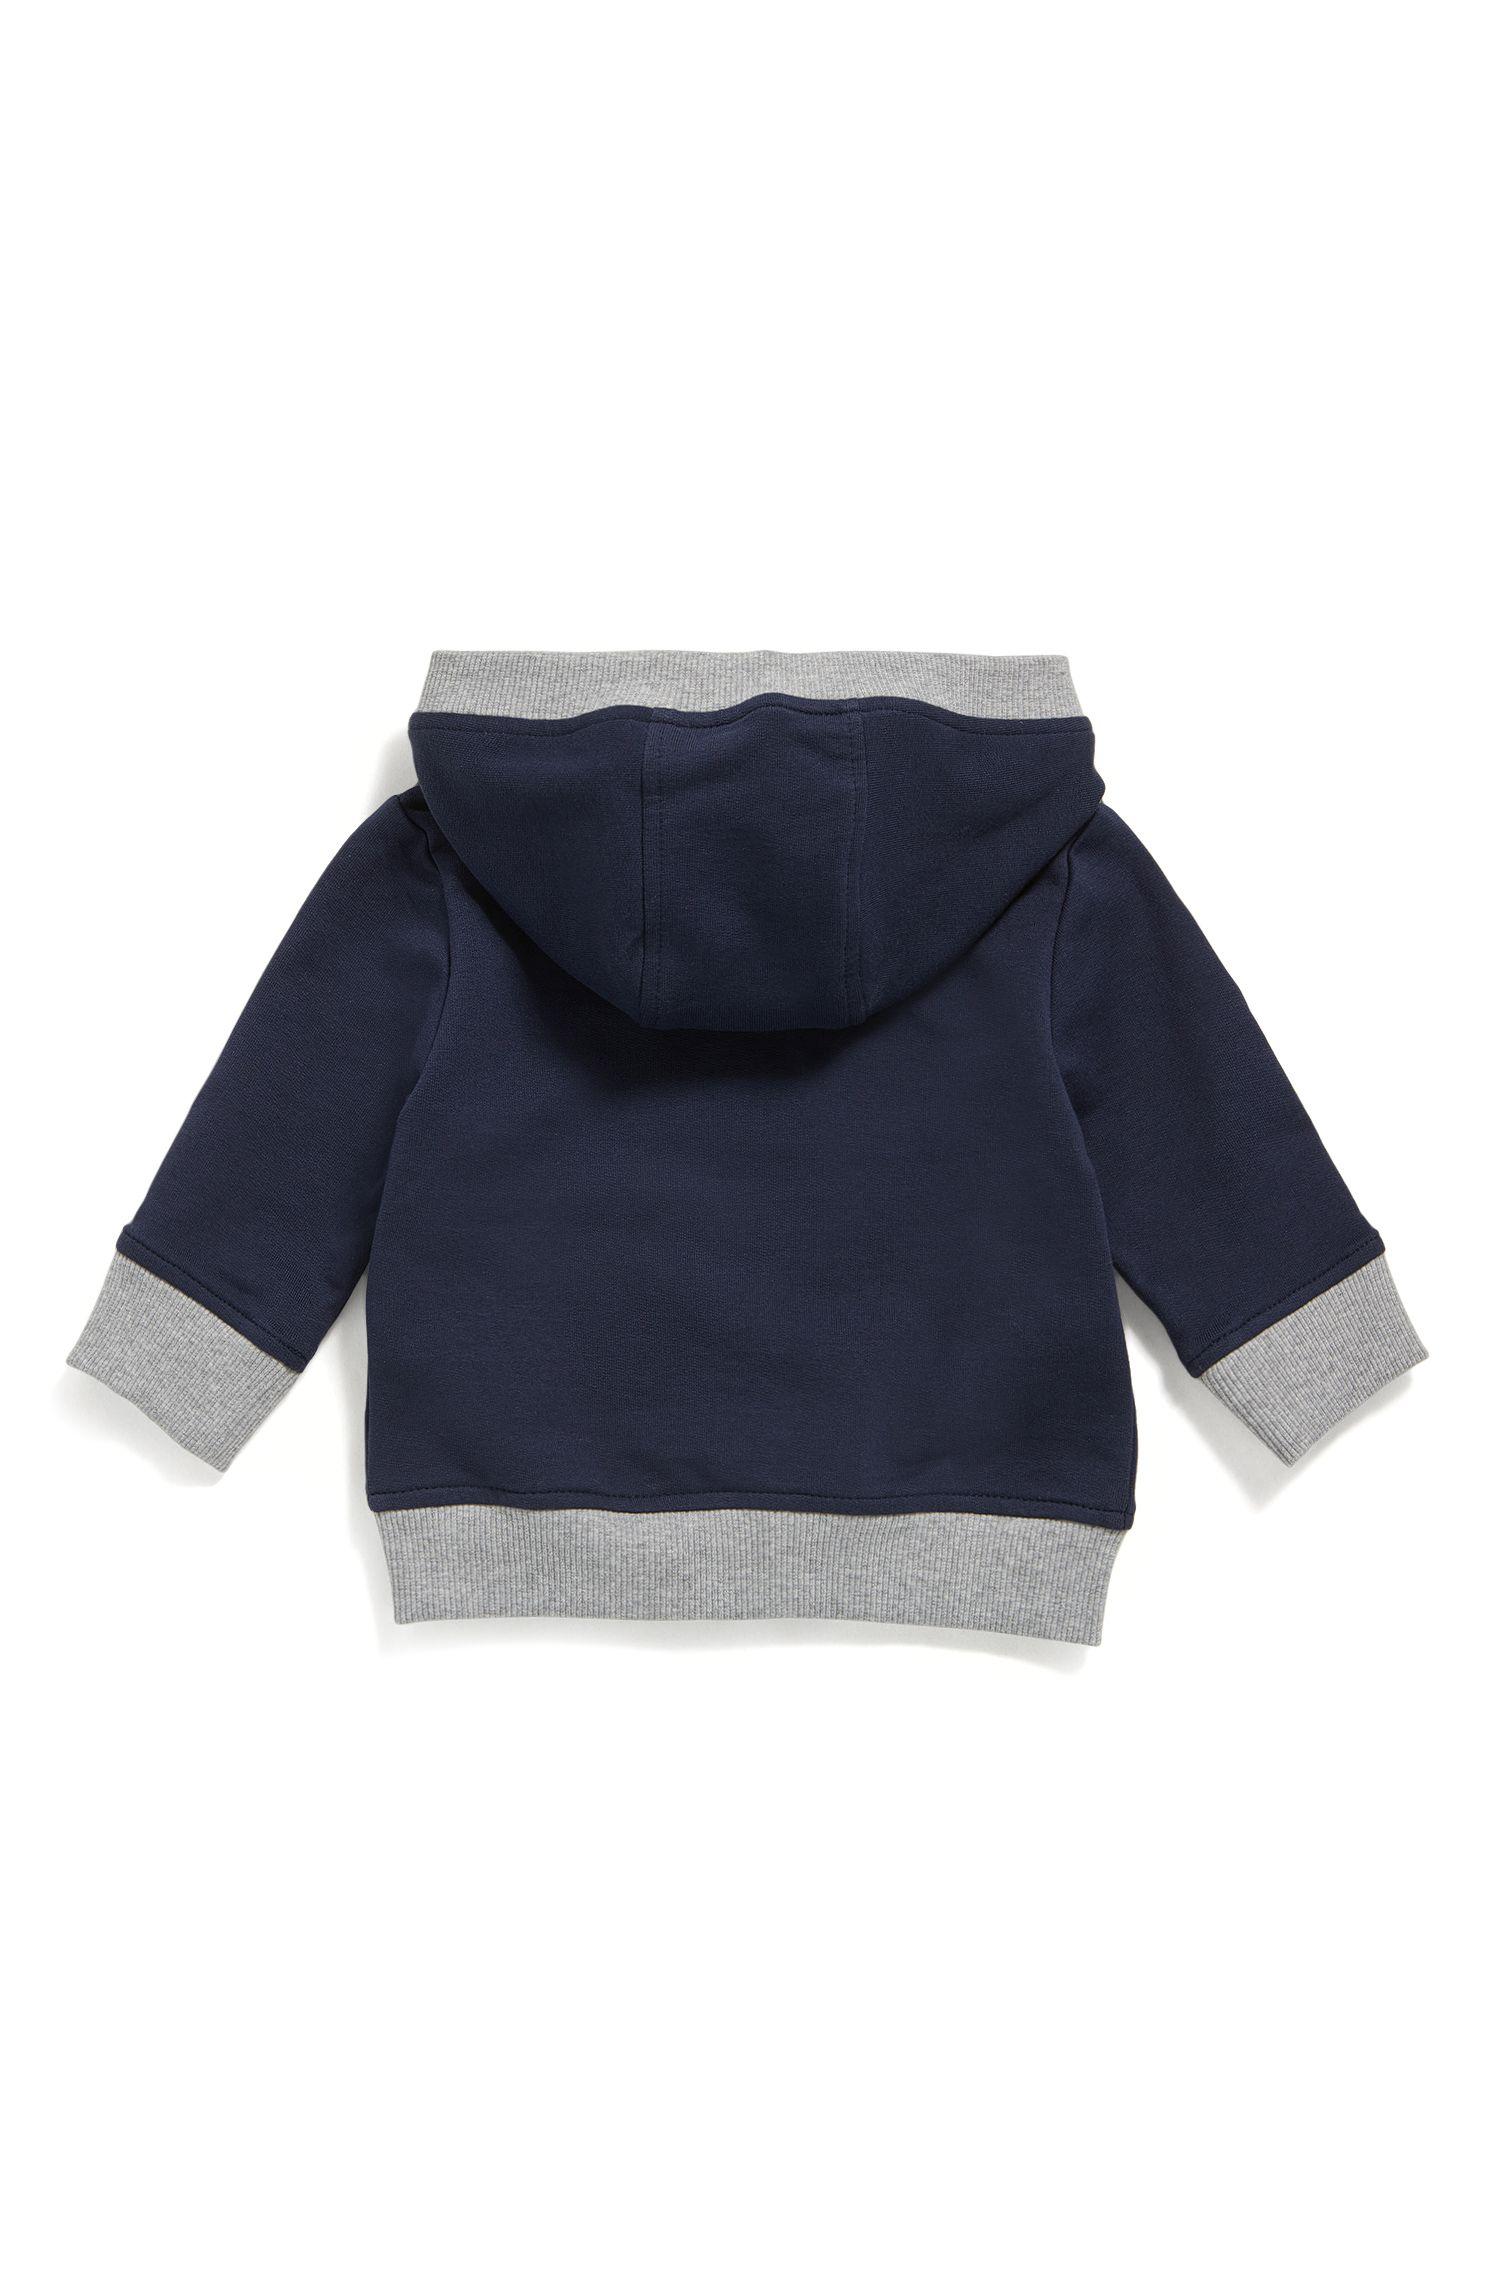 Kids-Kapuzenjacke aus Stretch-Baumwolle